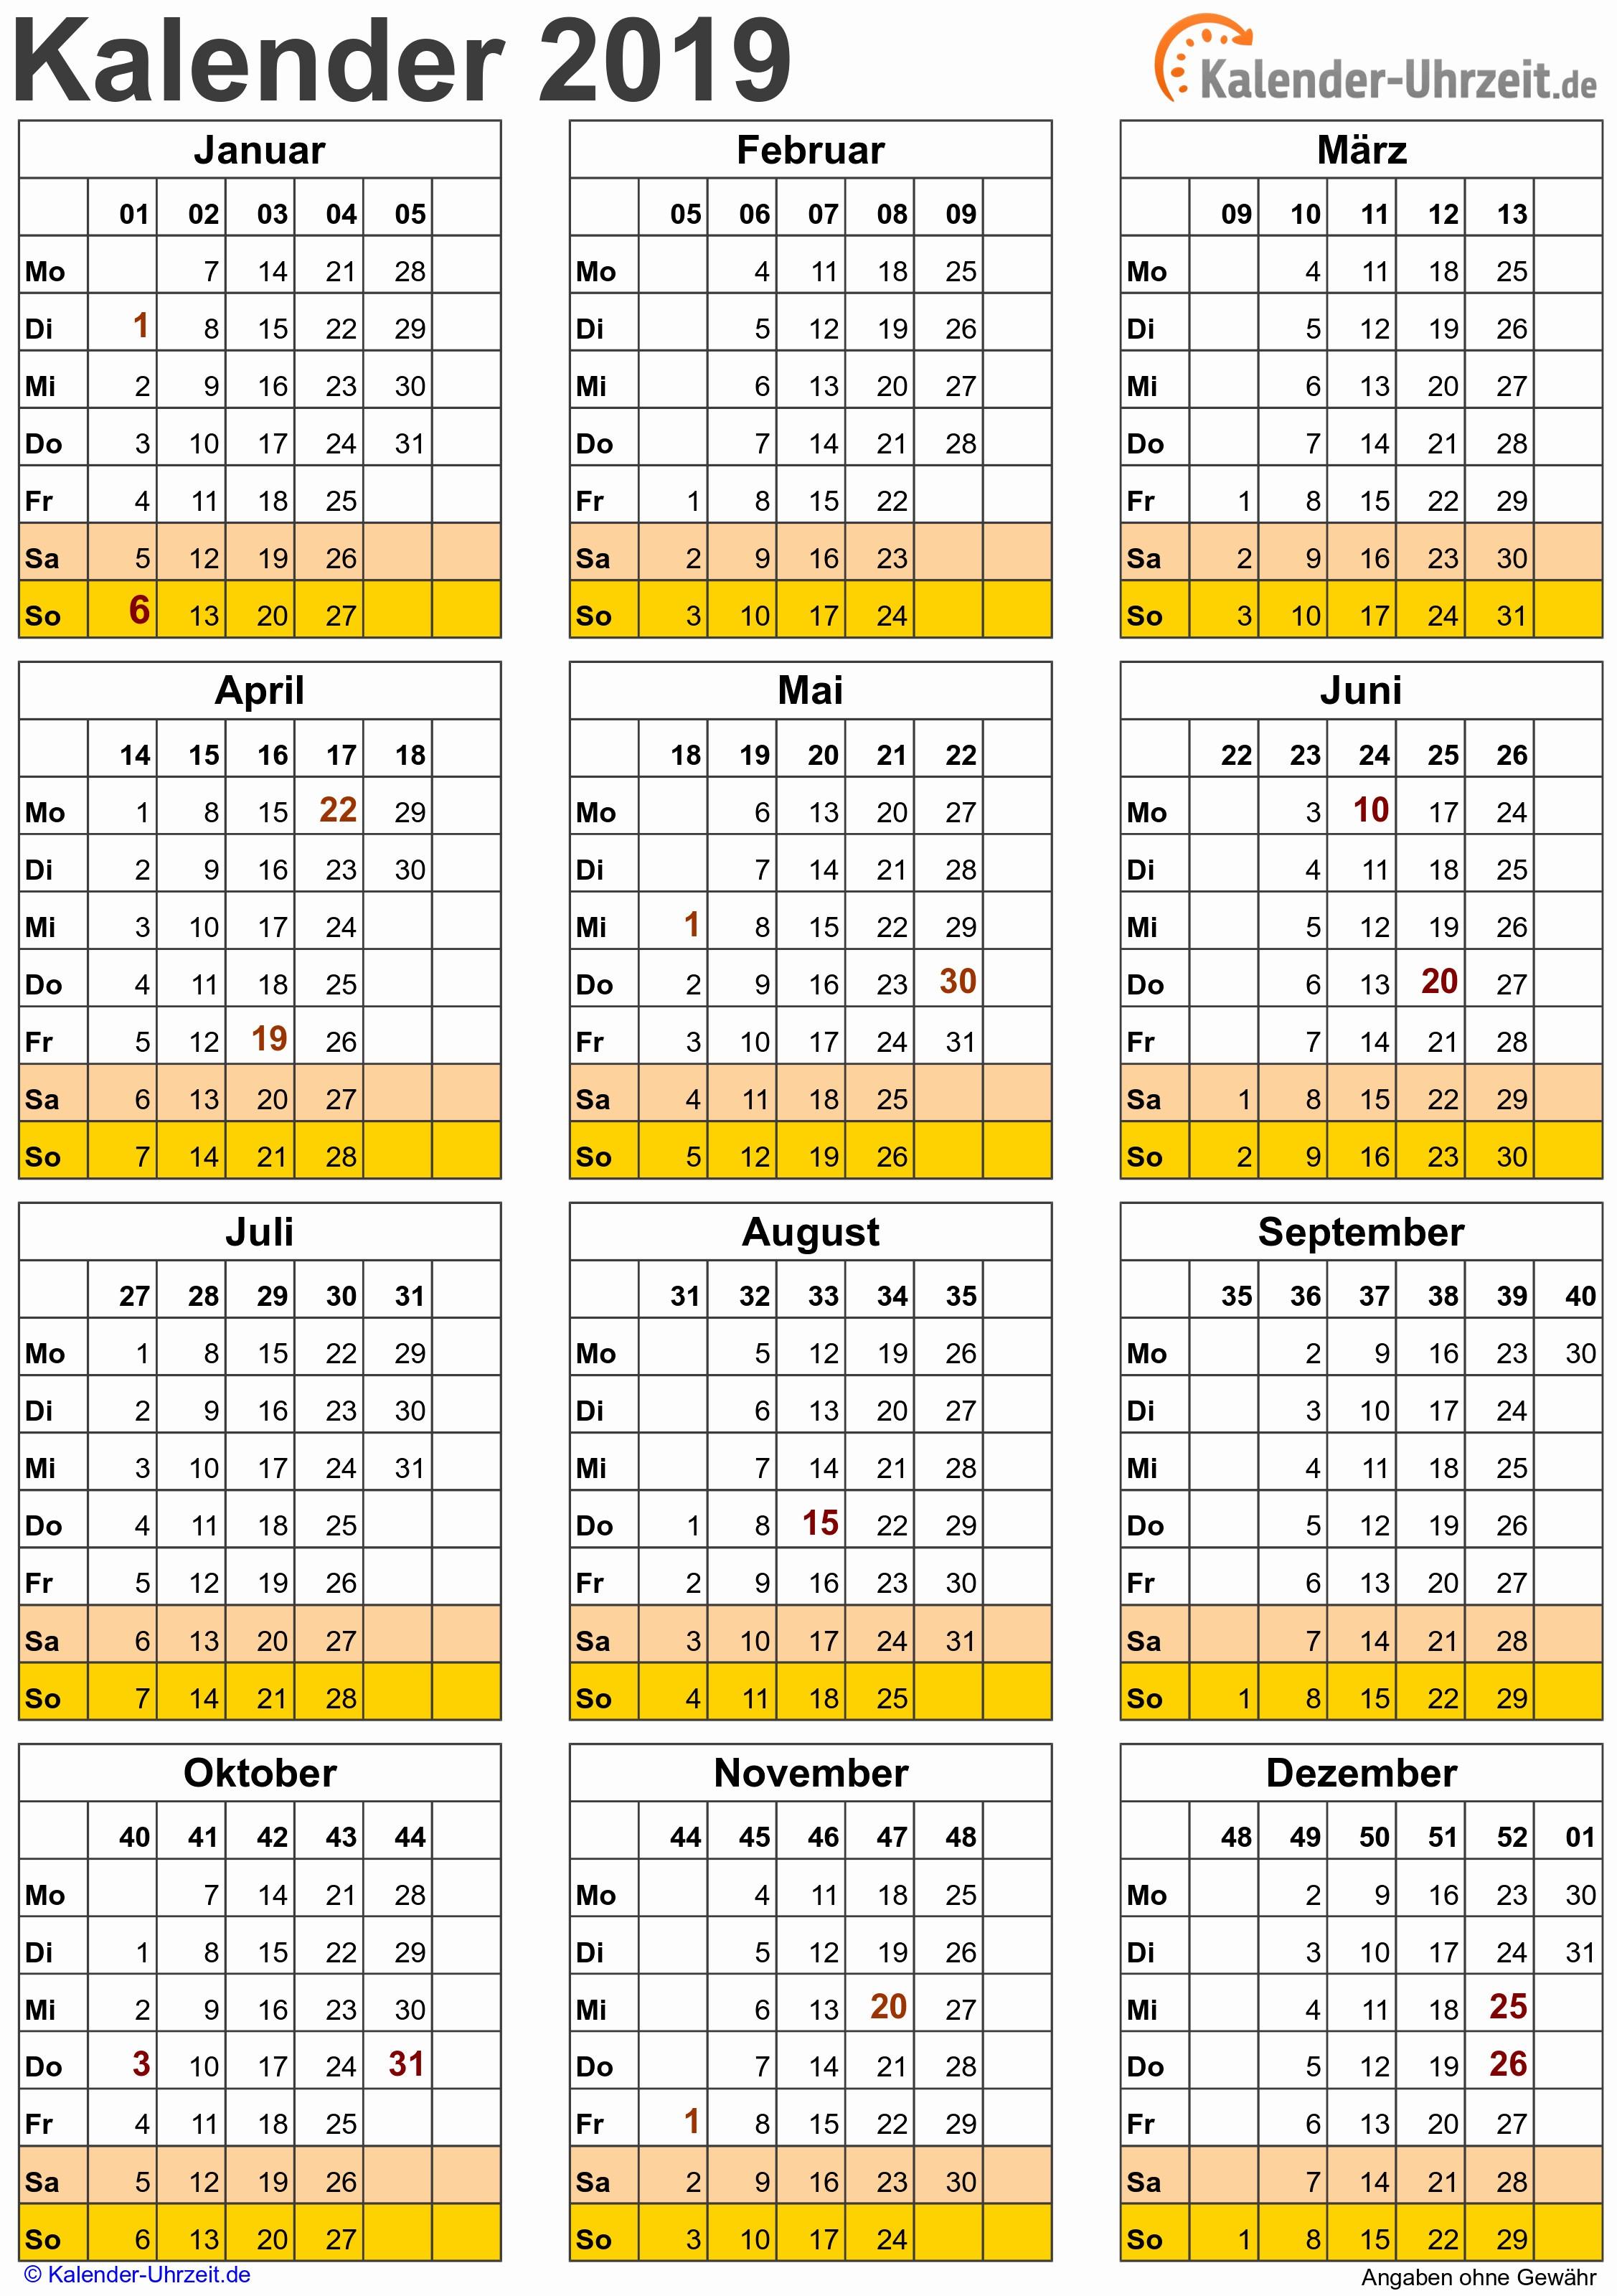 Kalender 2019 Indonesia Pdf Download Más Actual Pdf Kalender 2019 2020 Bayern Kalender 2019 Zum Ausdrucken Kostenlos Of Kalender 2019 Indonesia Pdf Download Más Reciente Pdf Kalender 2019 2020 Bayern Dreijahreskalender 2018 2019 2020 Als